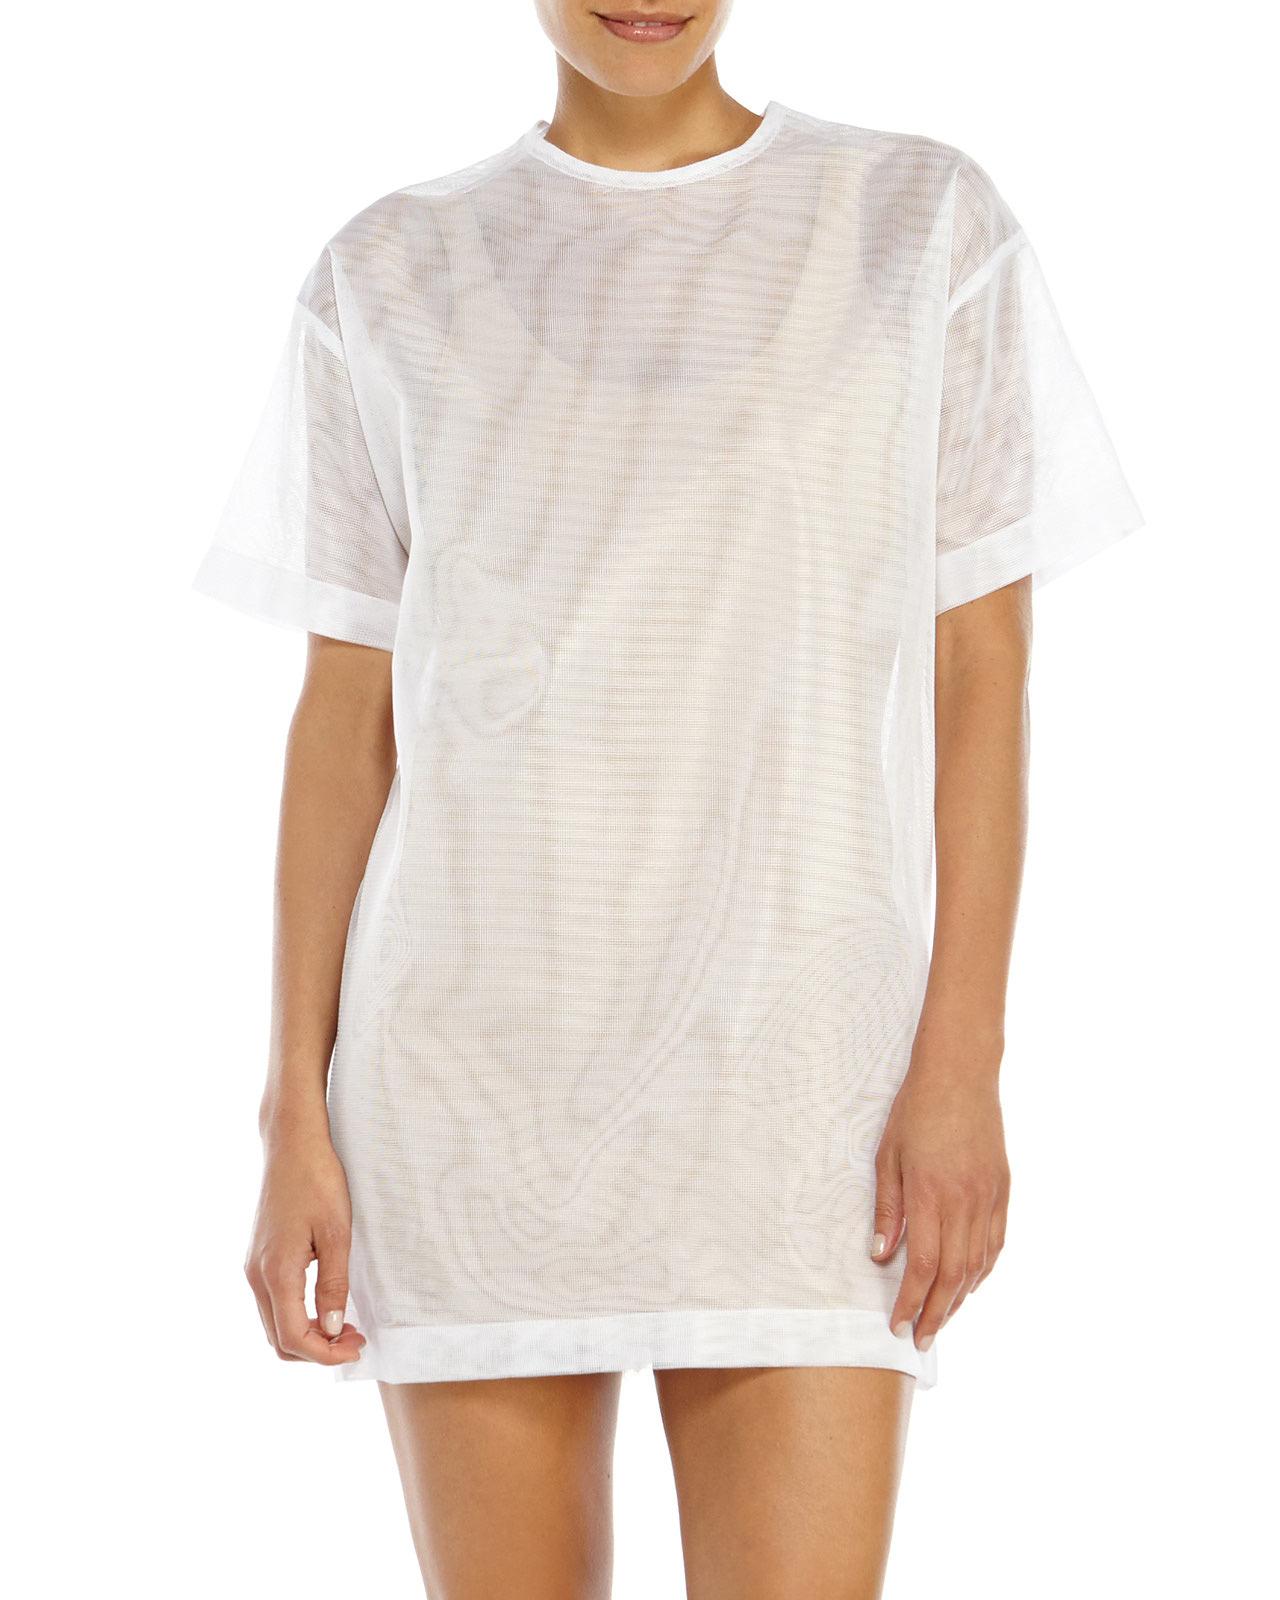 Jacquemus White Mesh T-Shirt Dress in White | Lyst